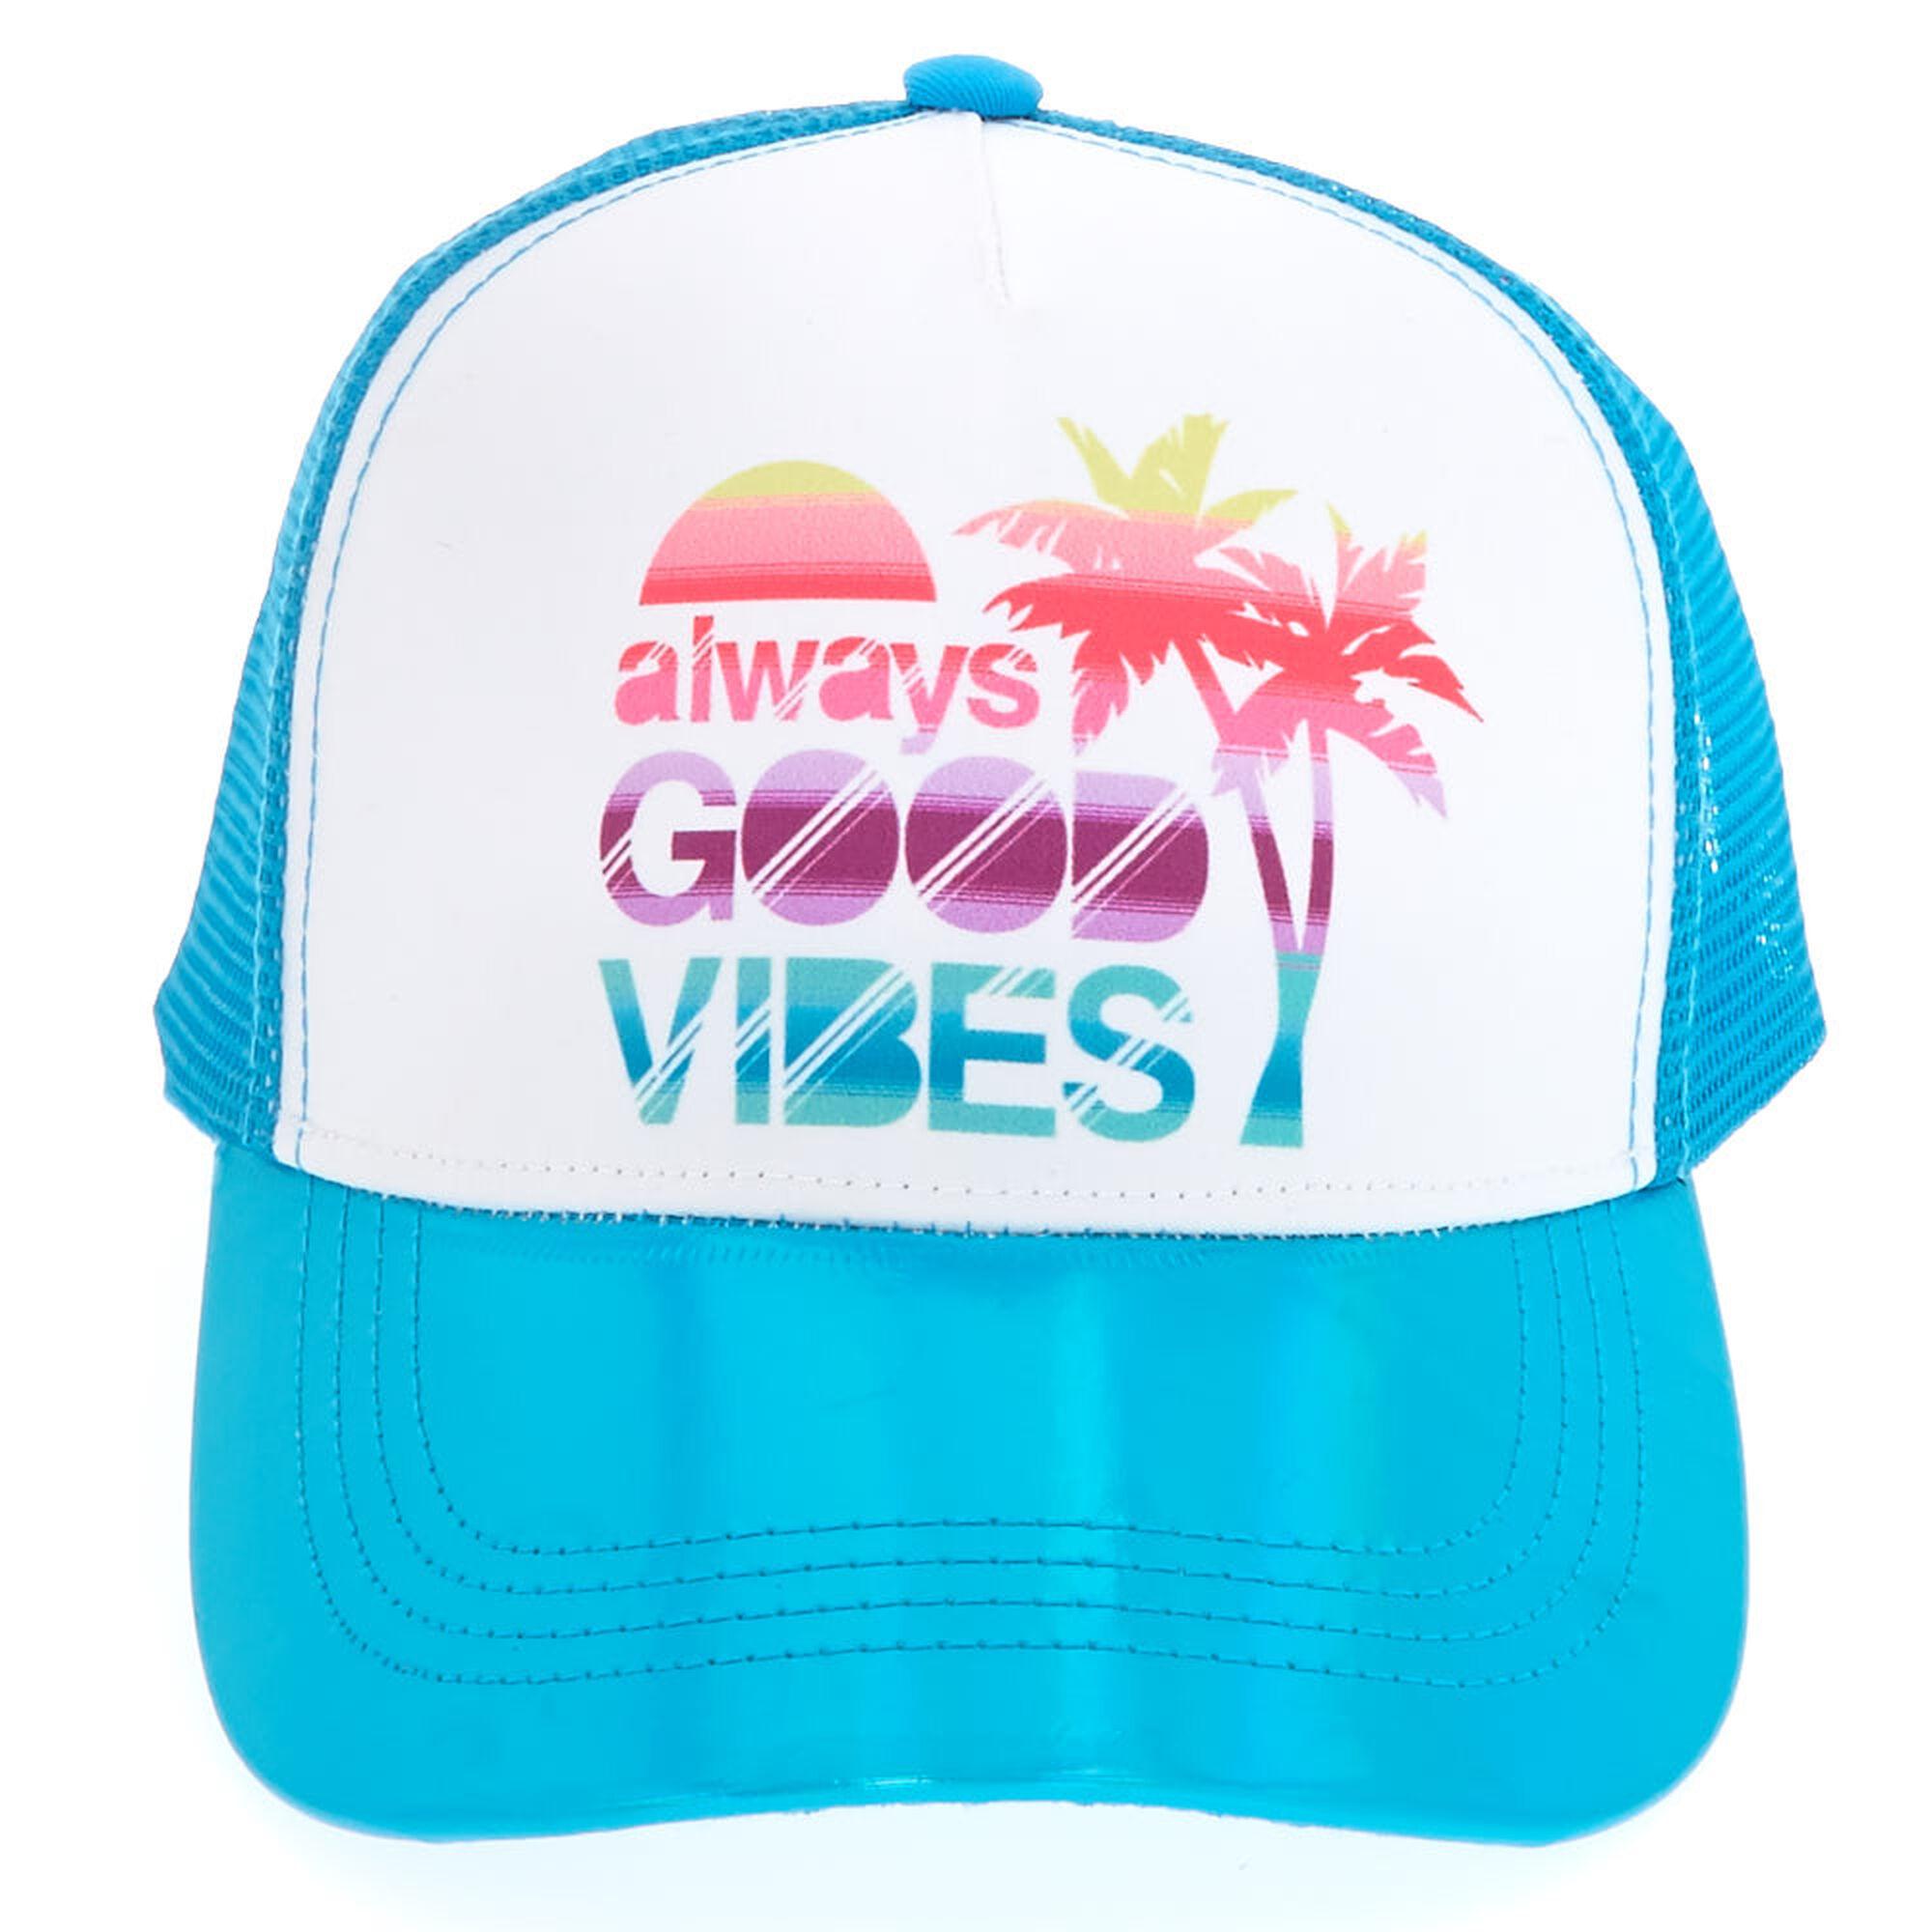 4d70474dc9a ... Always Good Vibes Trucker Hat